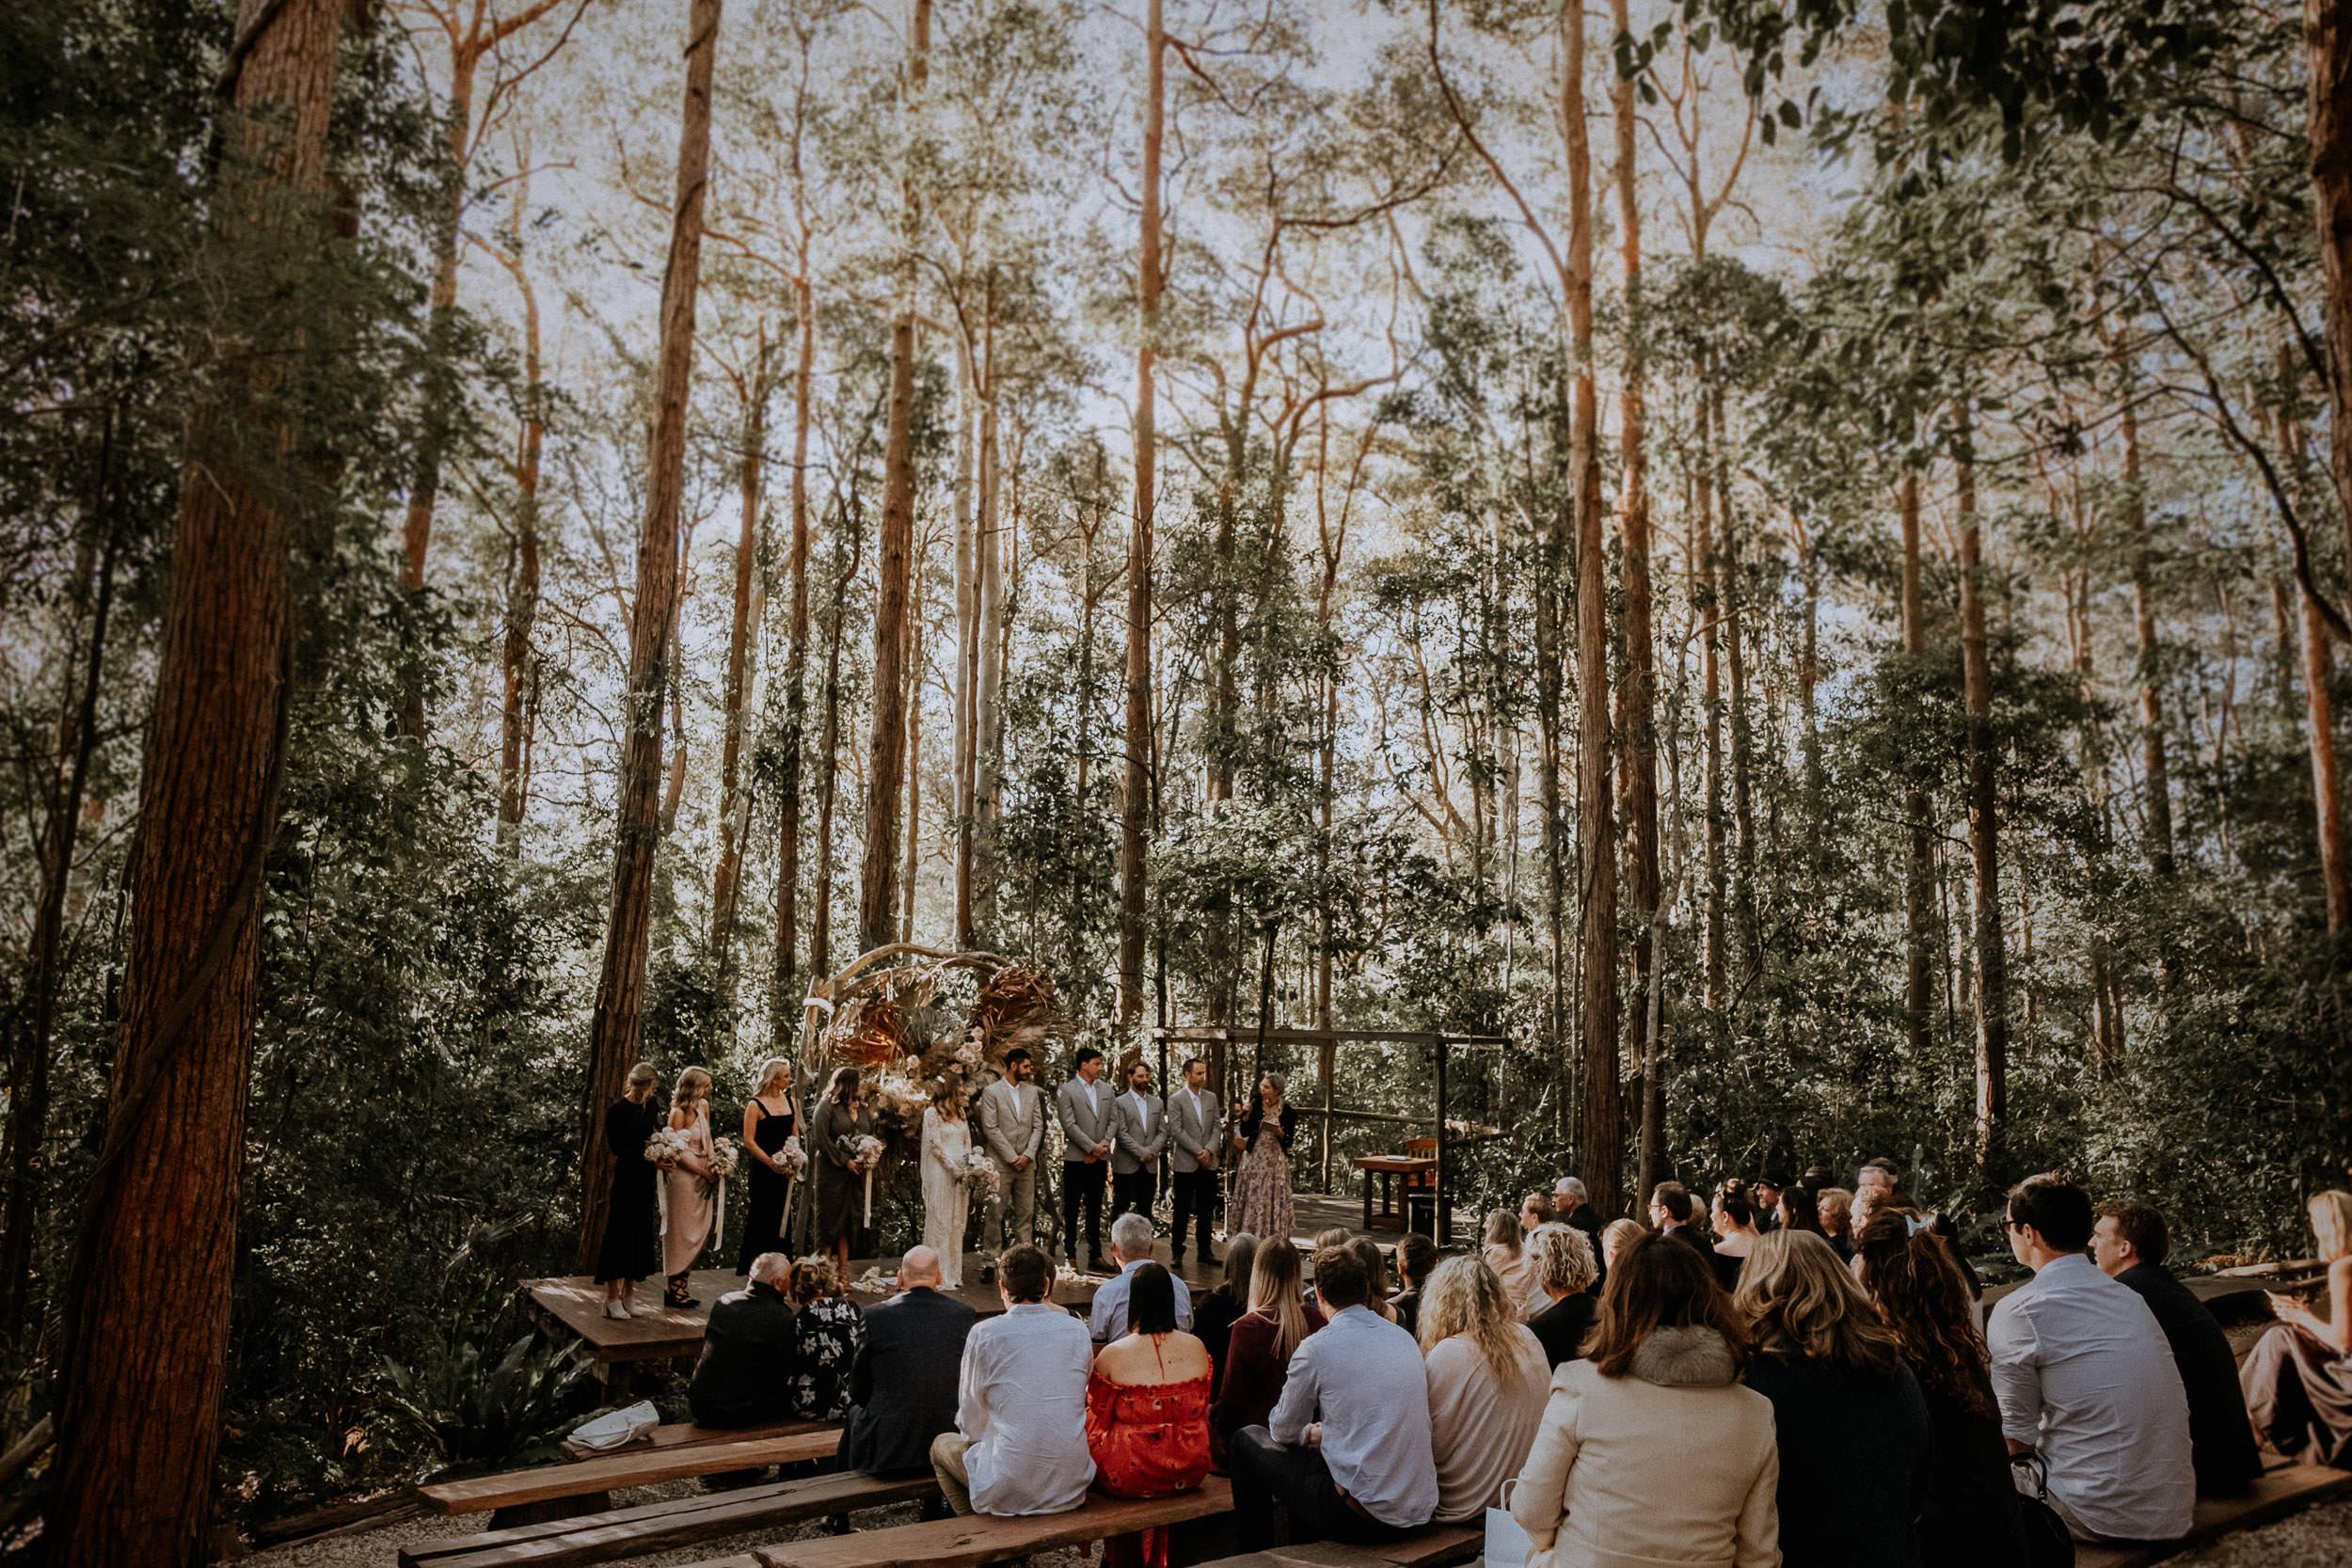 S&A Elopement - Kings & Thieves - Shred 'Til Dead - Central Coast Beach Forest Wedding - 184.jpg